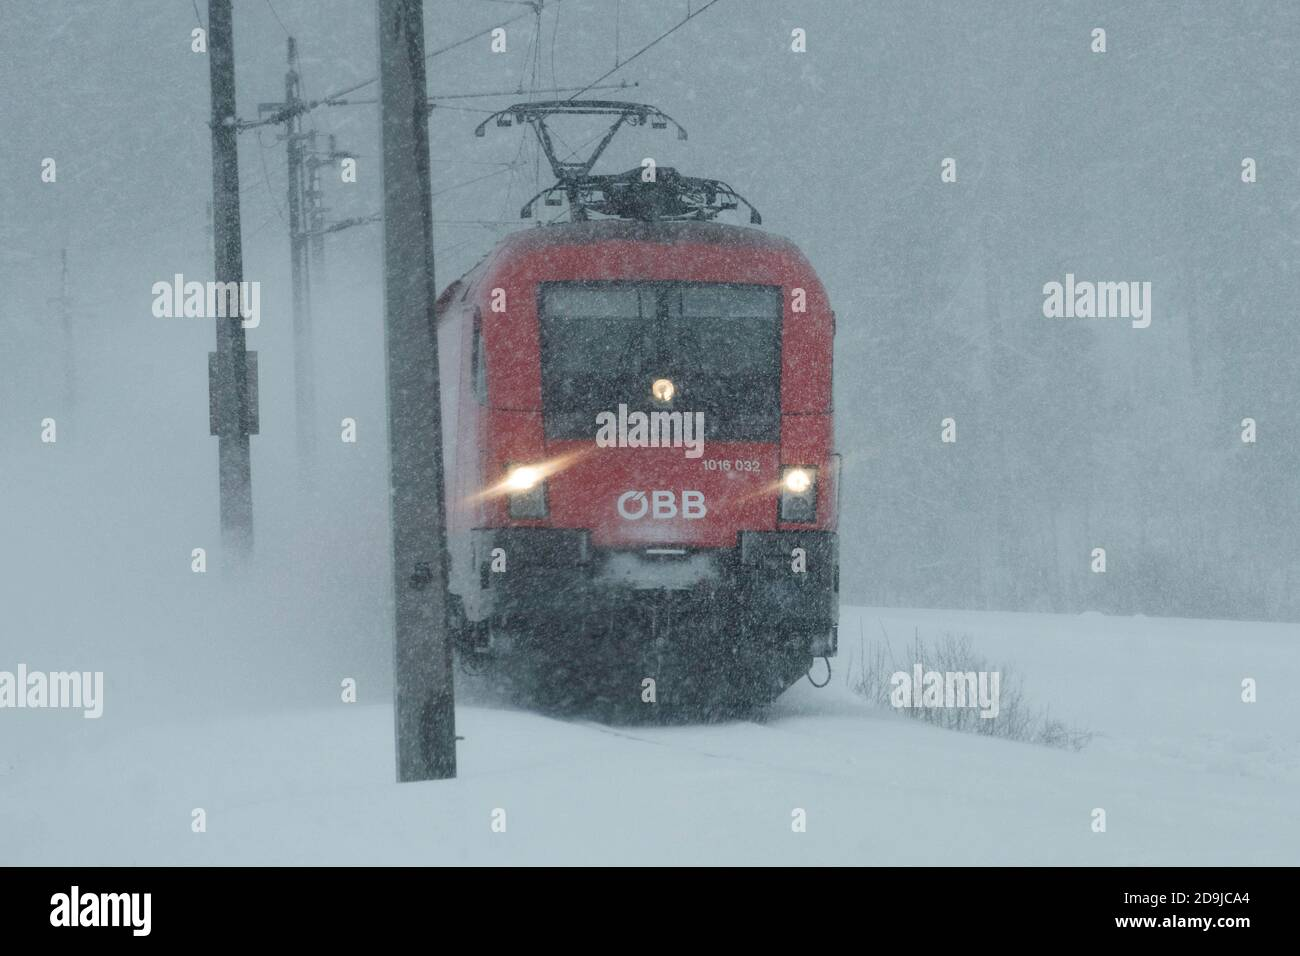 lokomotive im winterbetrieb Stock Photo